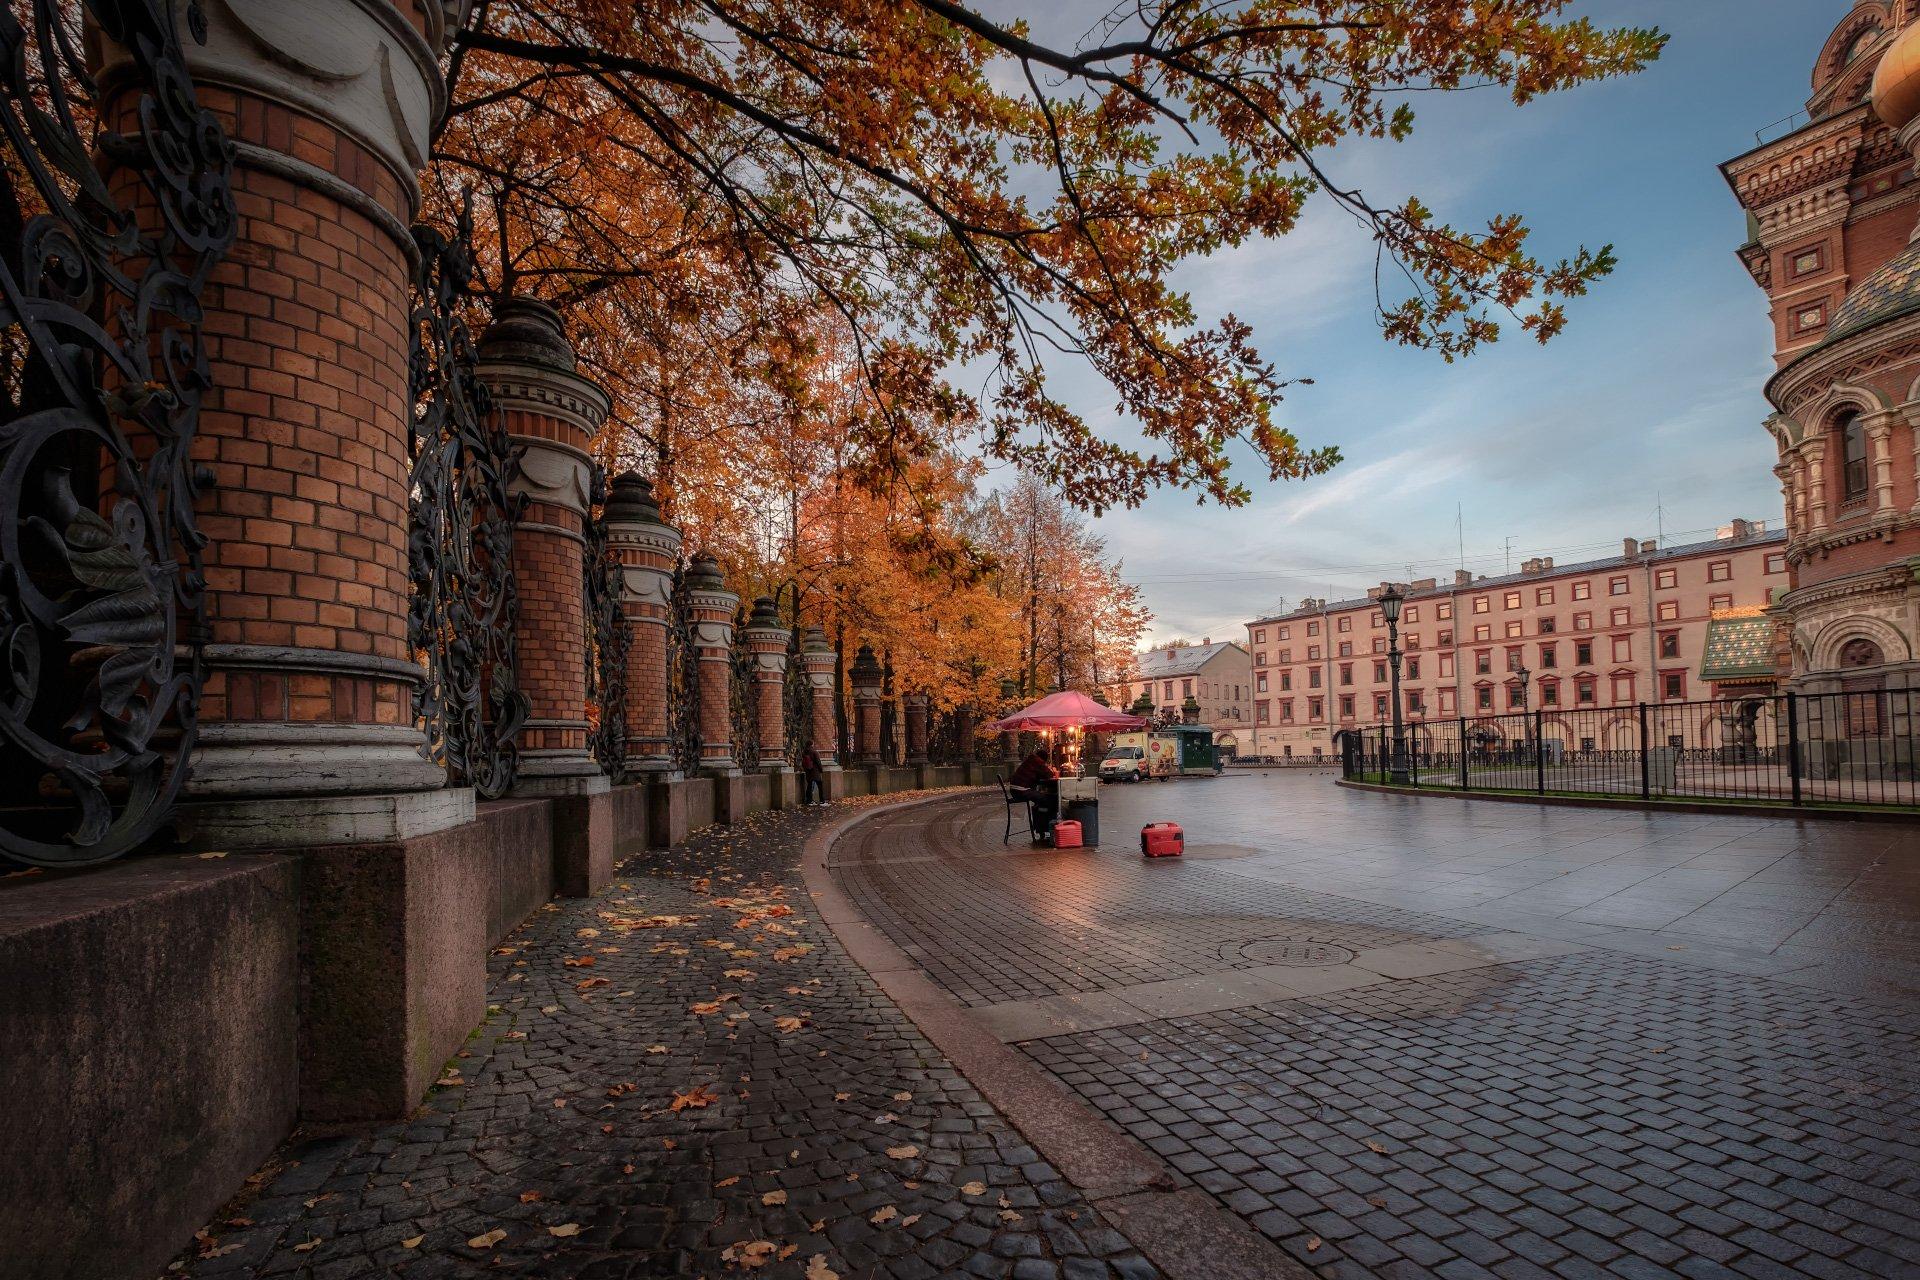 петербург, осень, спас на крови, ограда, листва, утро, пасмурно, Андрей Чиж